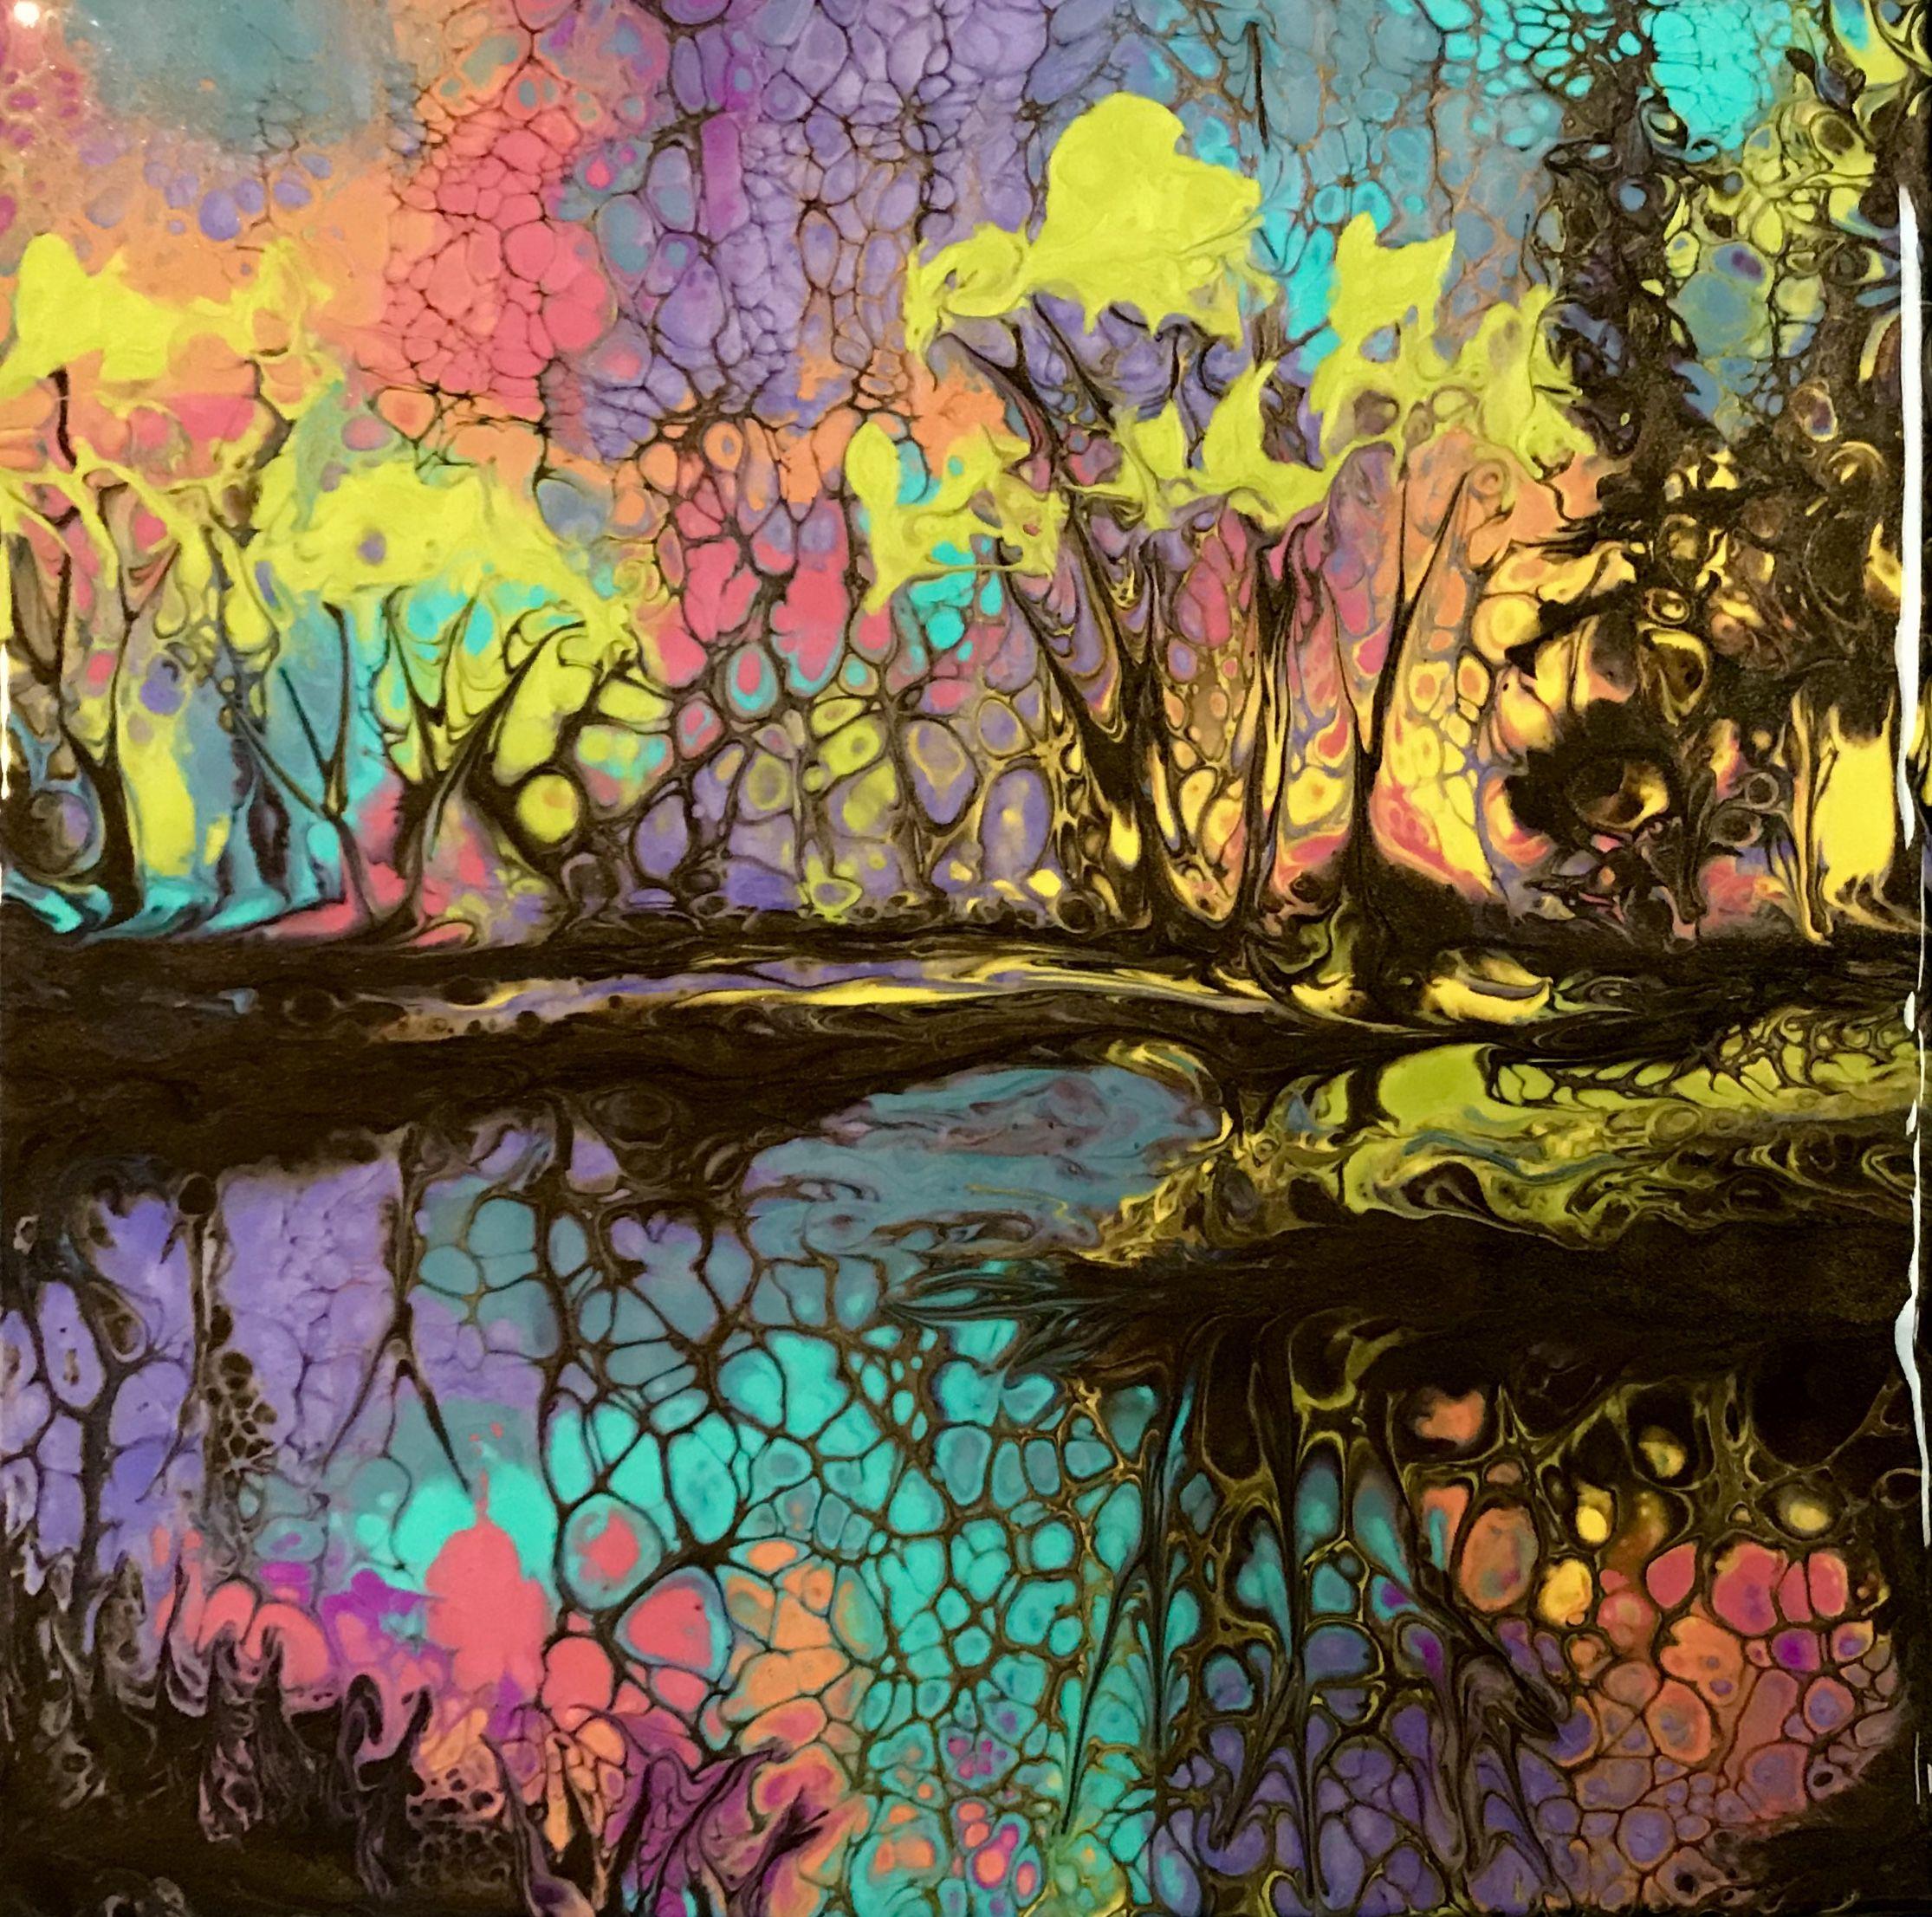 Acrylic pouring. Swipe method | Paintings in 2019 ...